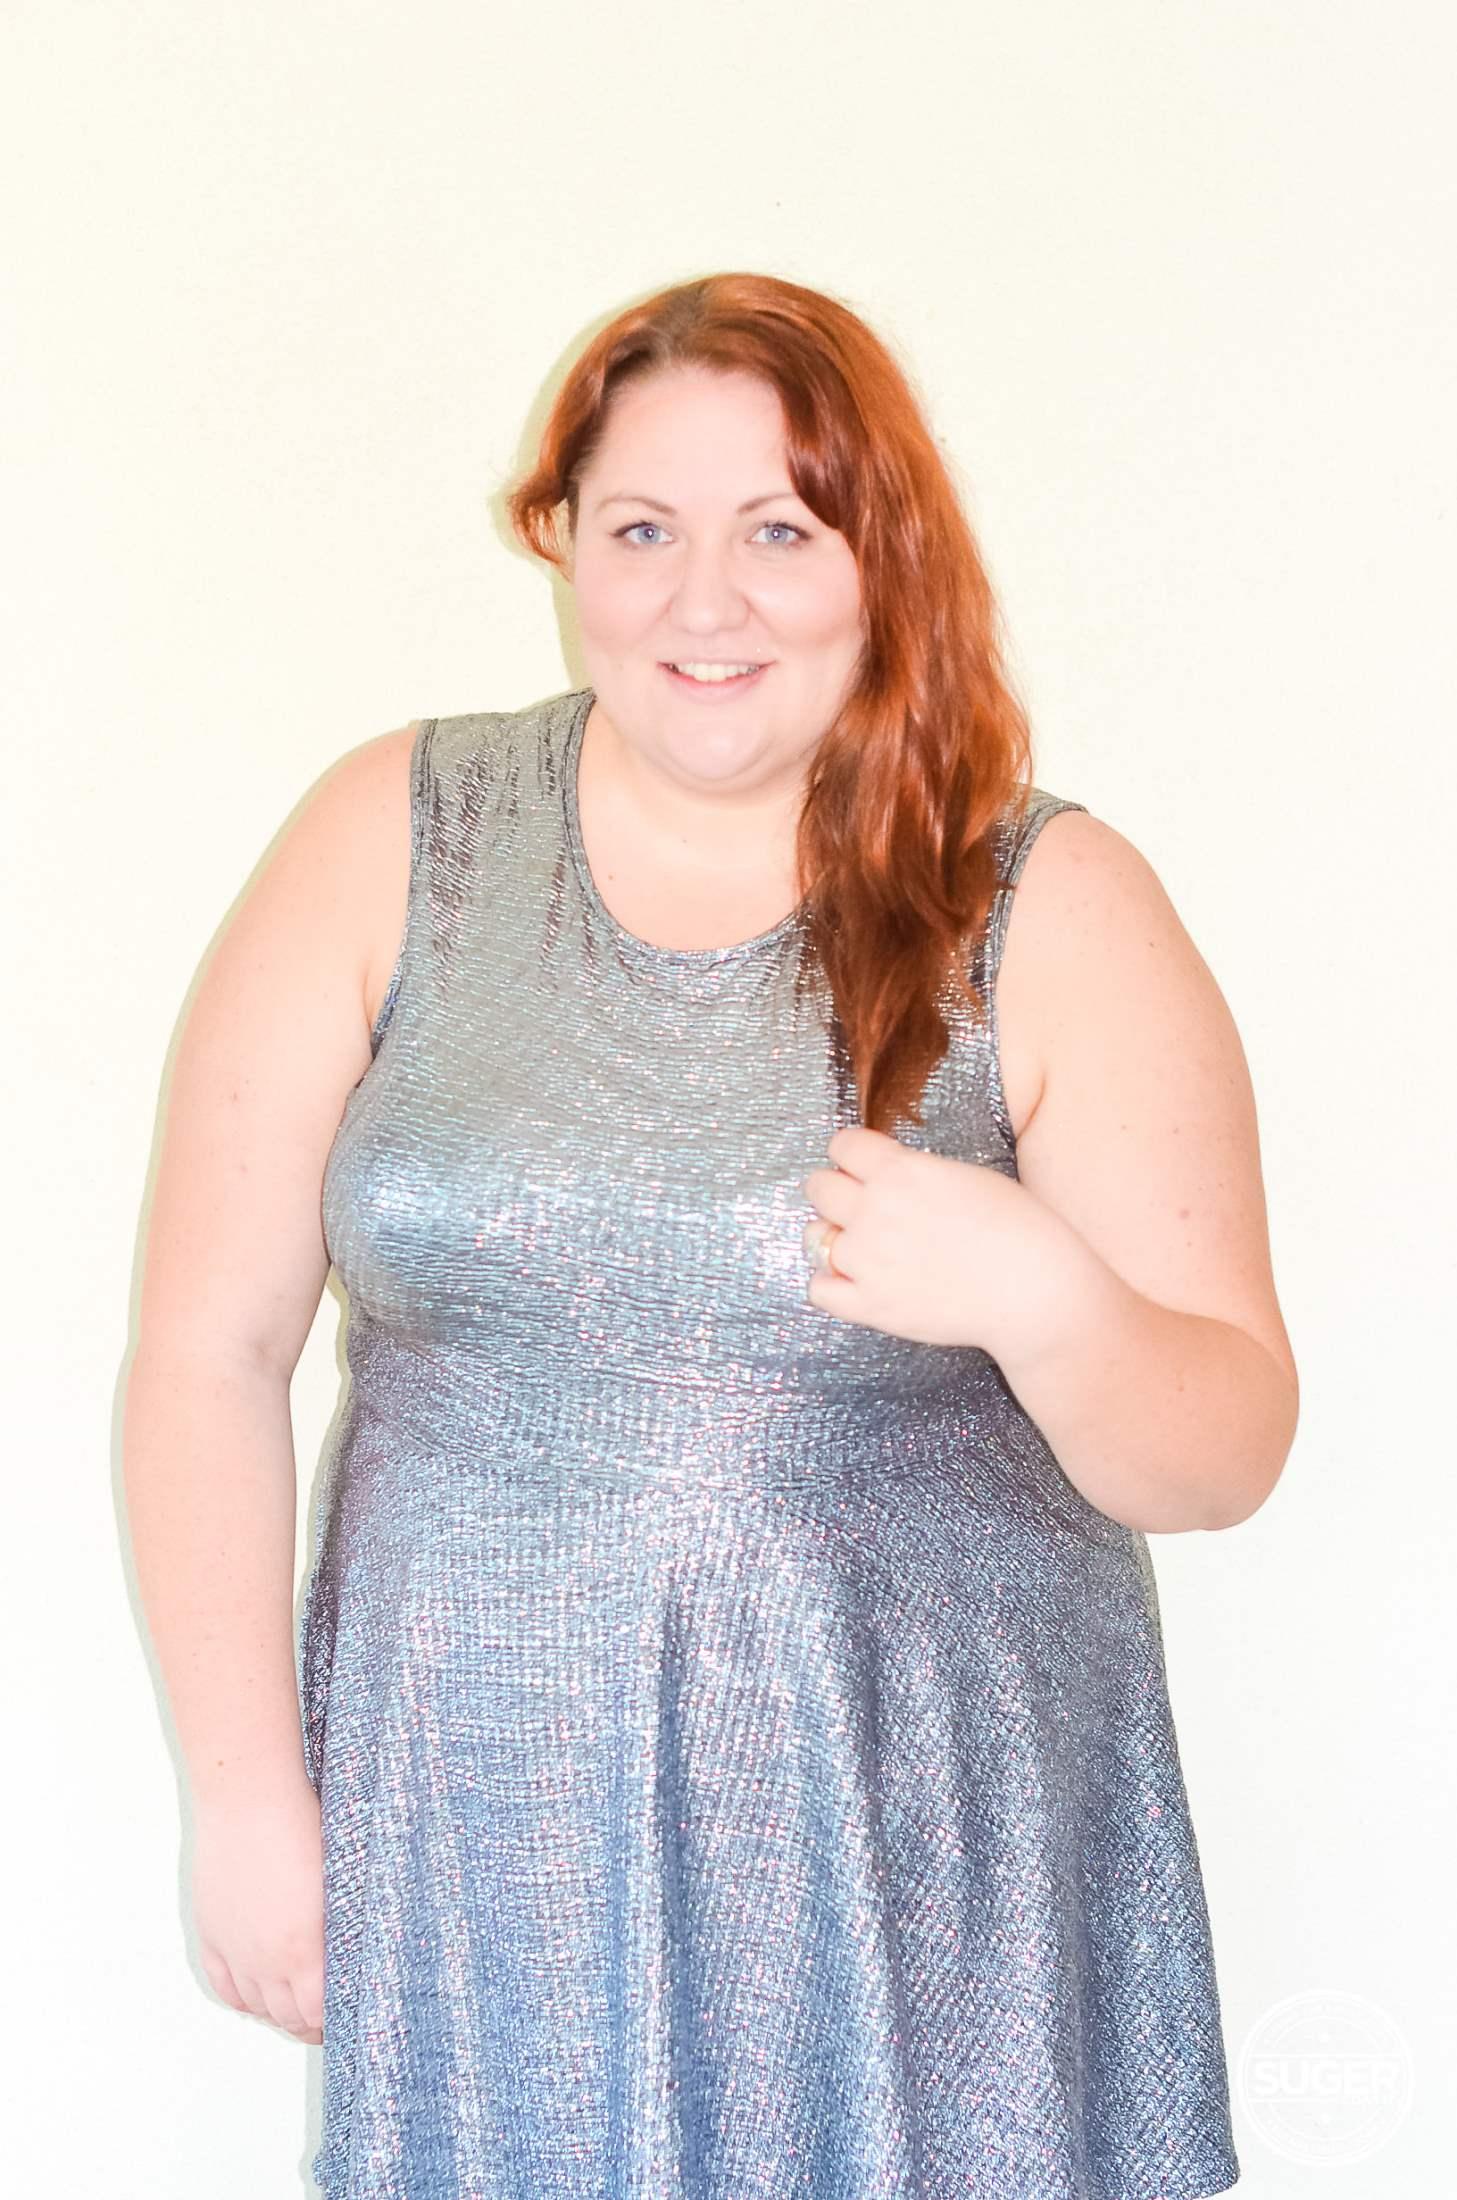 Aussie Curves: Sparkle